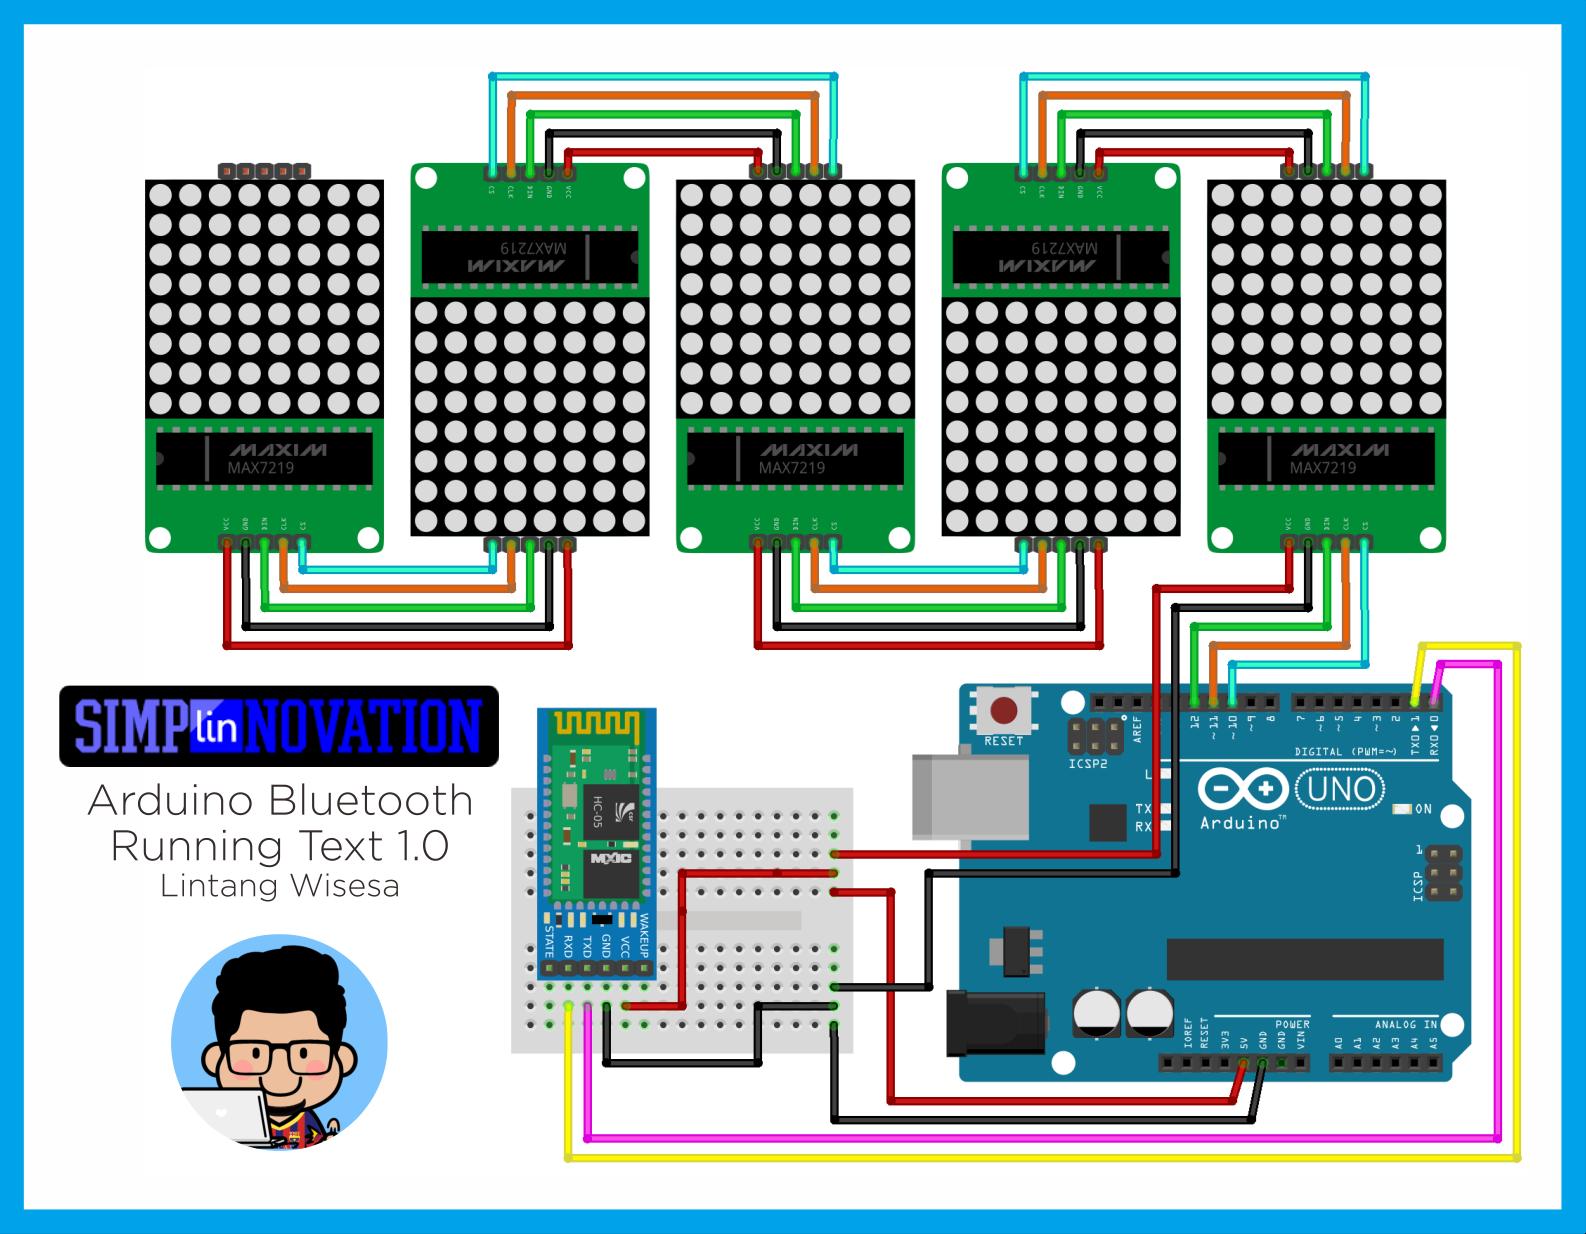 GitHub - LintangWisesa/Bluetooth-Running-Text-1 0: A simple Arduino